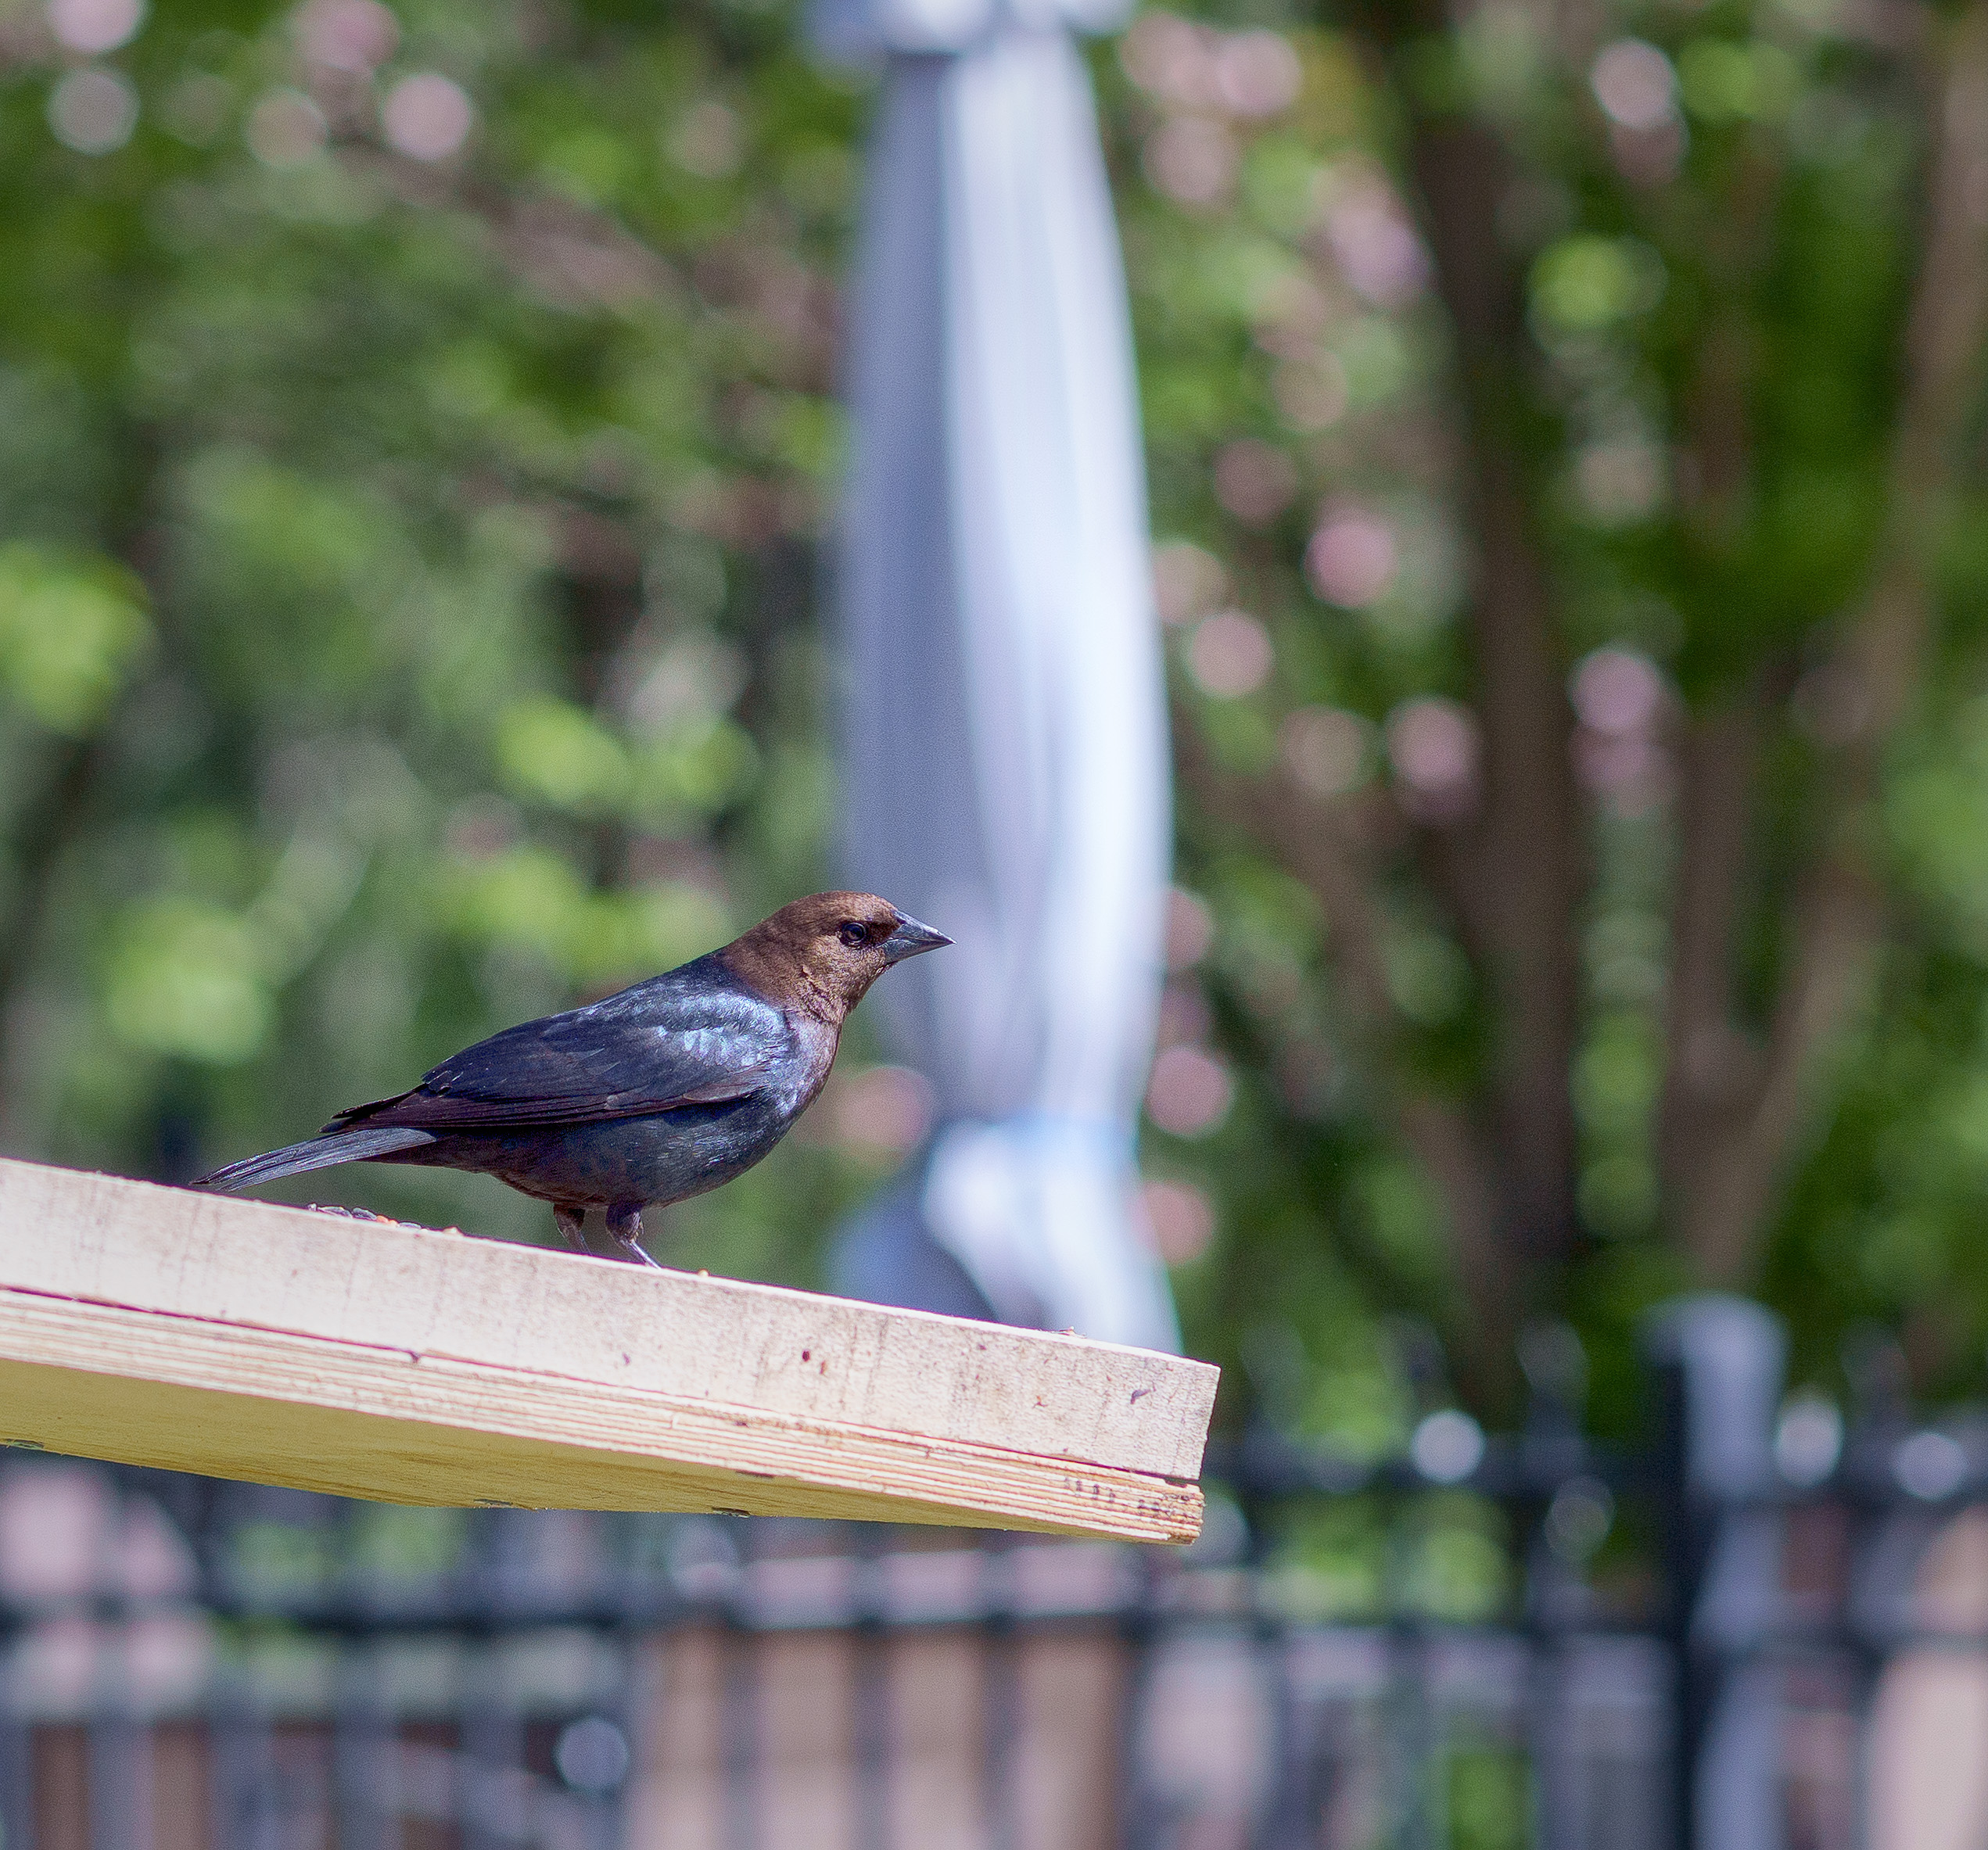 A black bird on a platform feeder